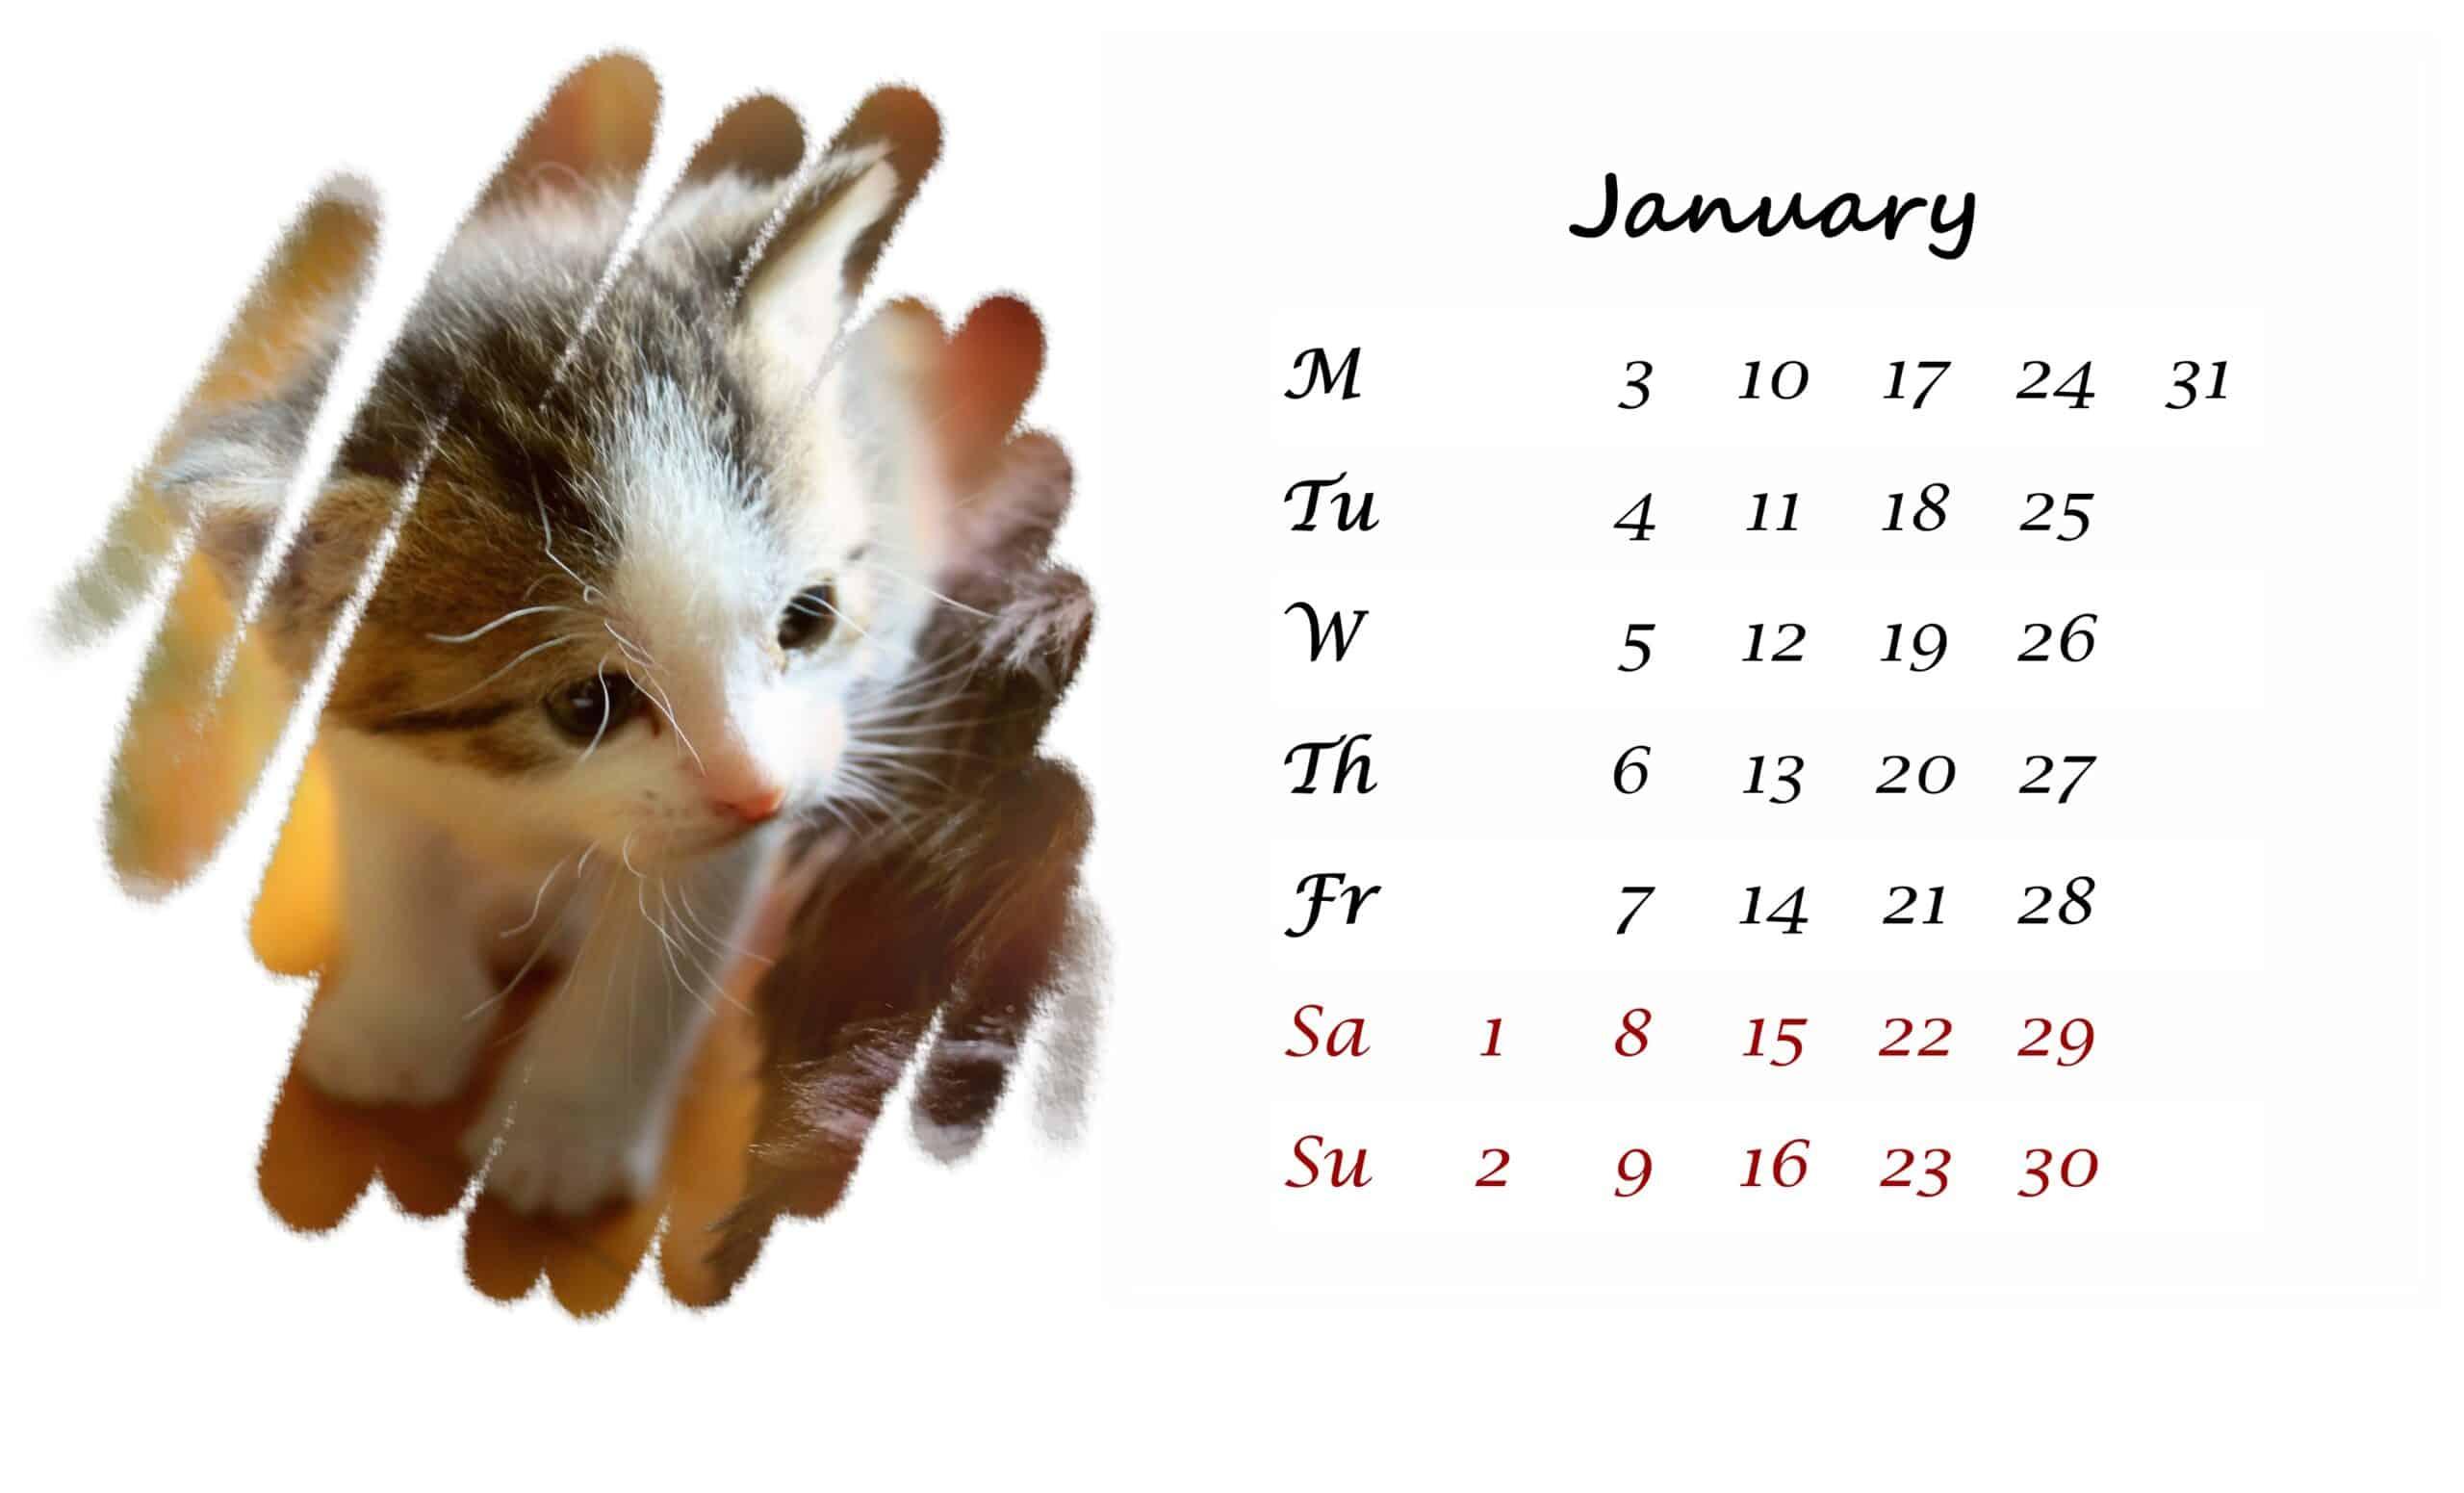 2022 January printable calendar